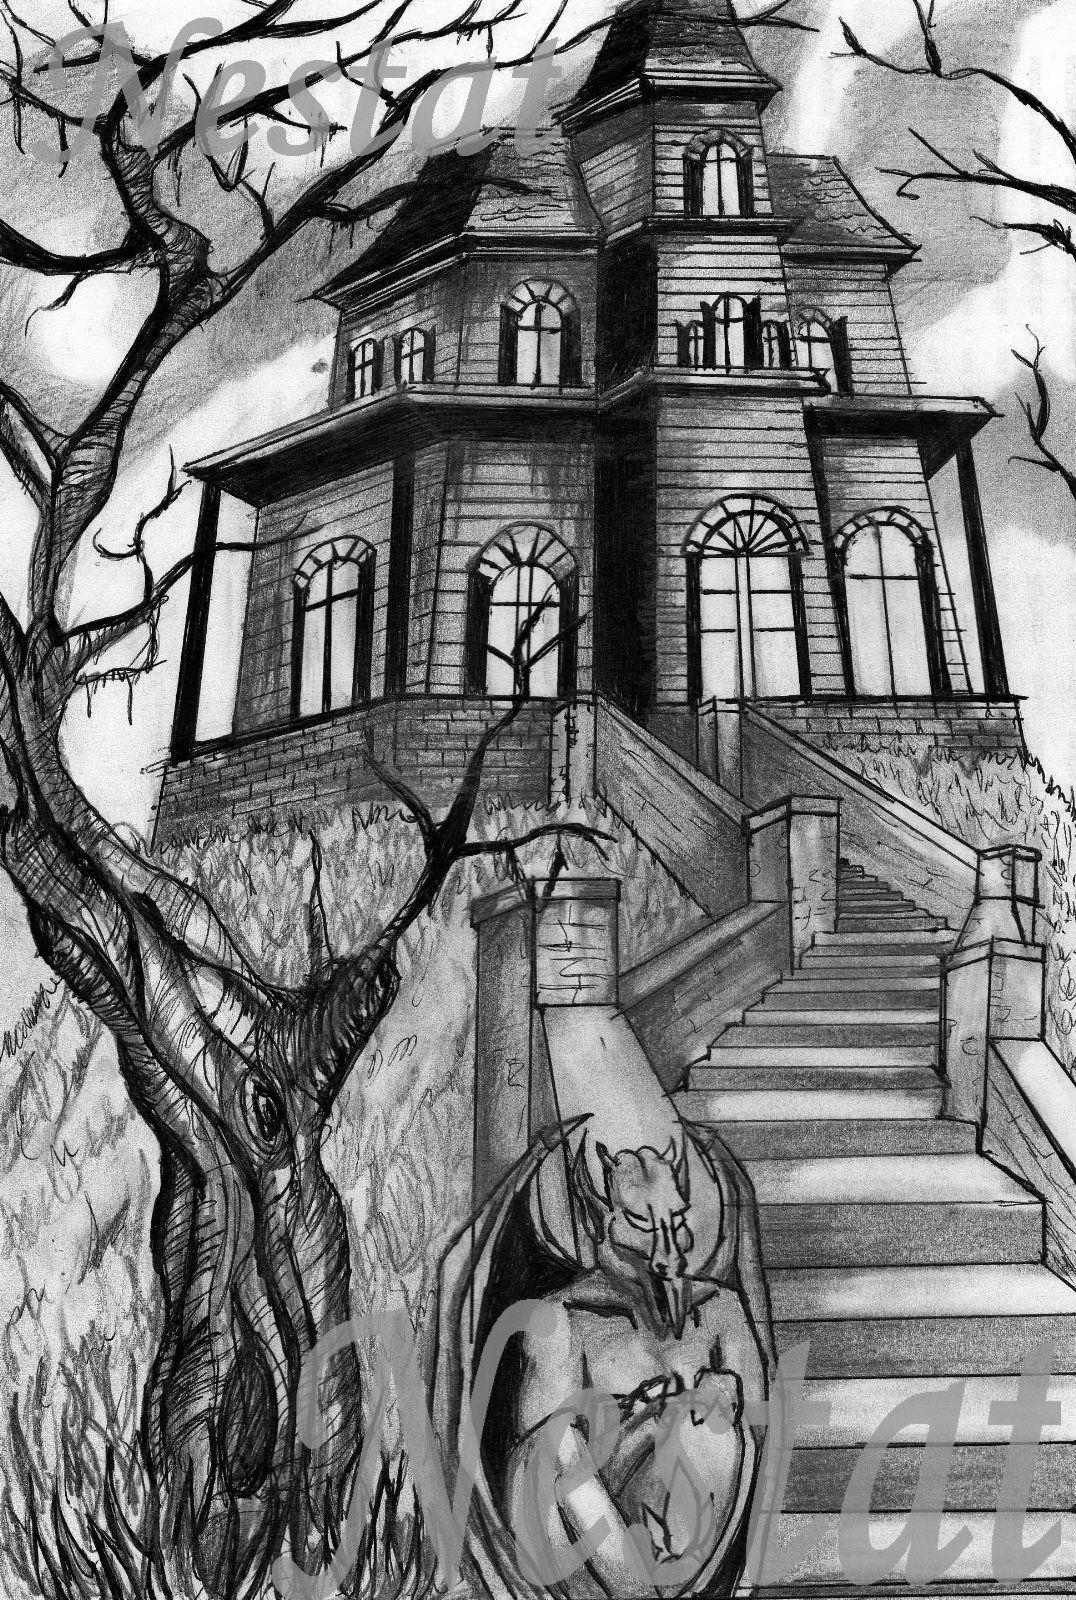 Dessin la main peinture manoir maison hant chateau everything jeff the killer art - Dessin manga image ...